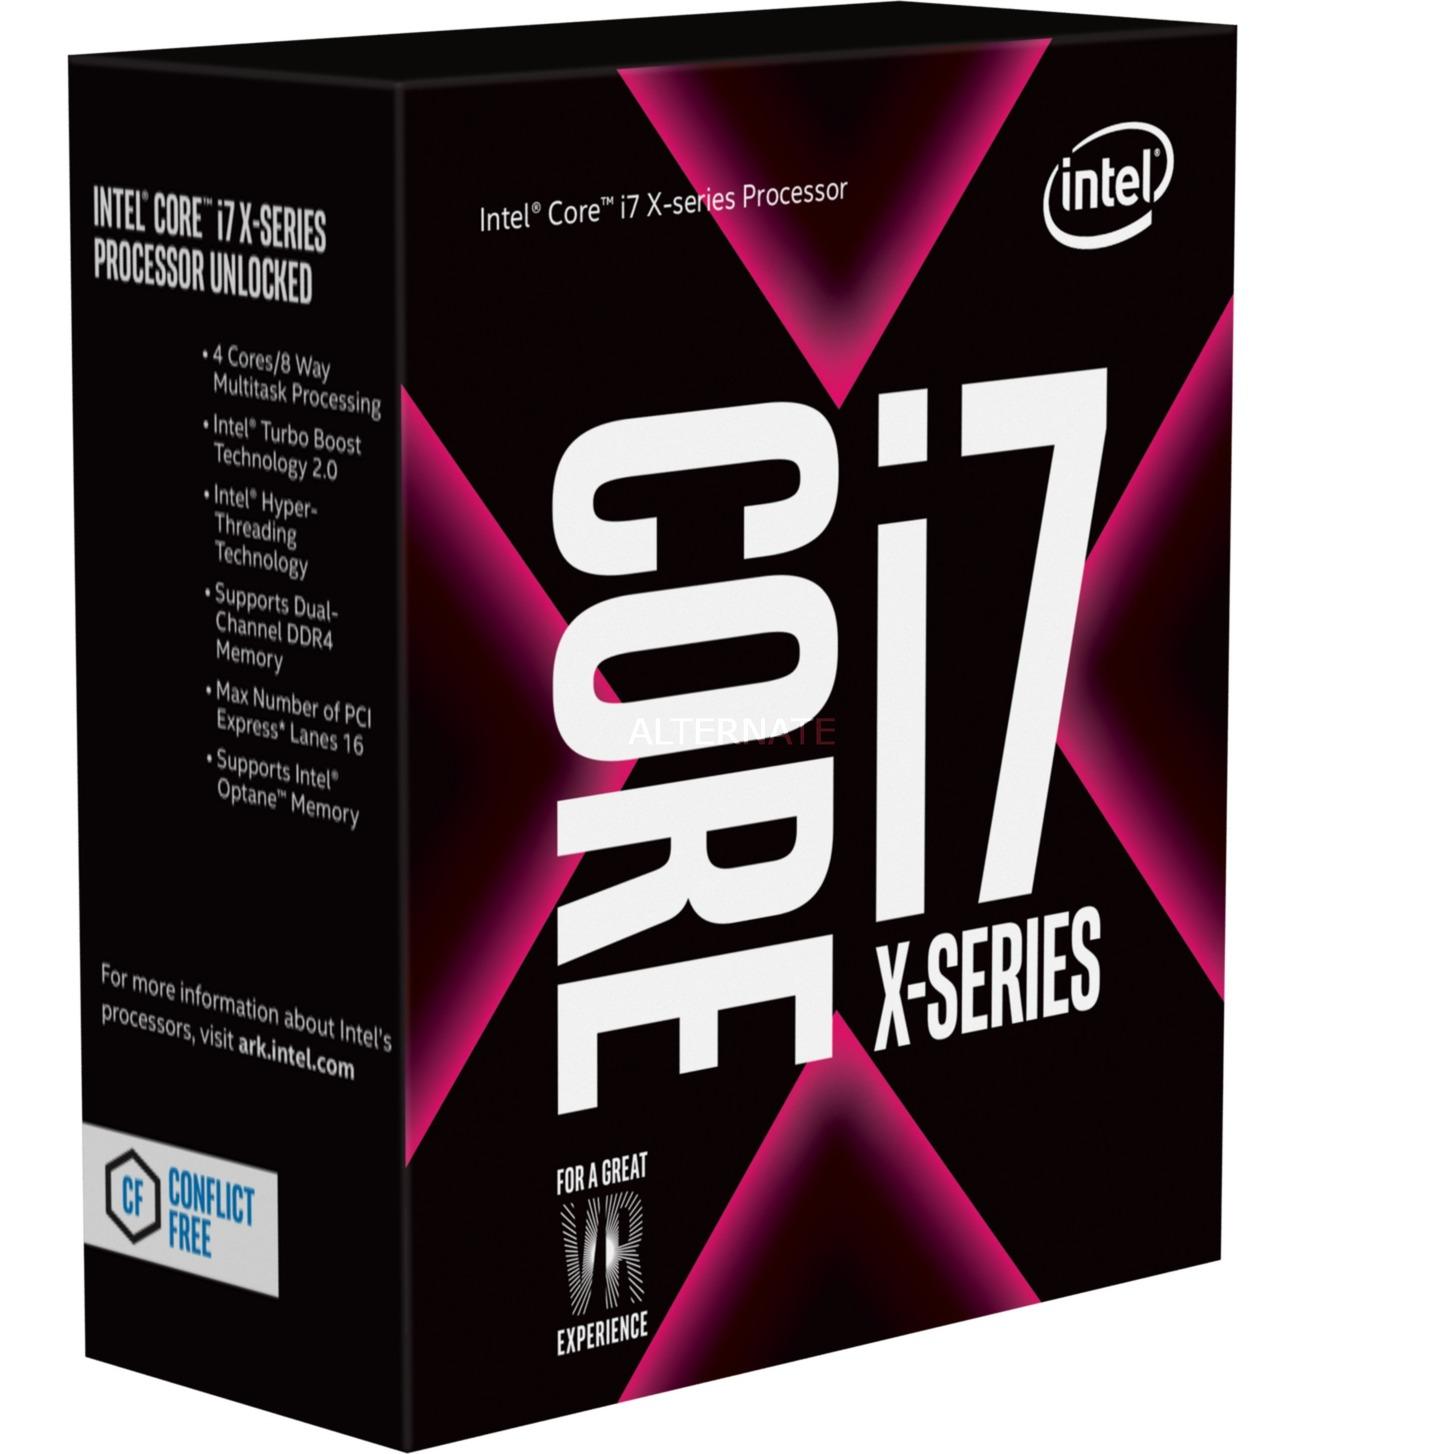 Core i7-7740X X-series Processor (8M Cache, up to 4.50 GHz) 4.3GHz 8MB Smart Cache Caja procesador